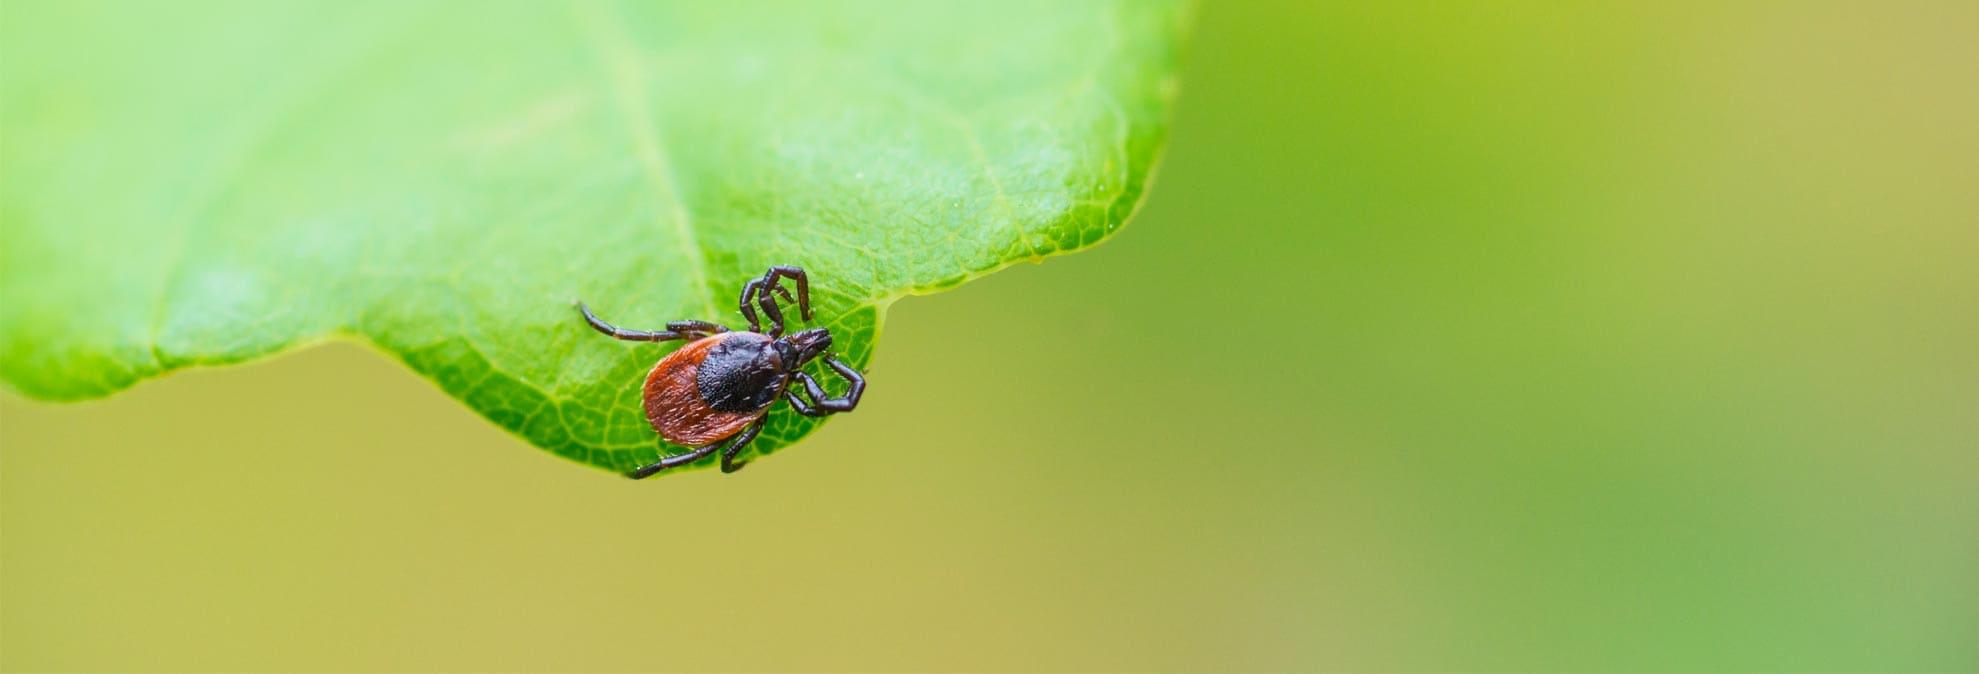 tick traps pesticides and tick borne diseases consumer reports